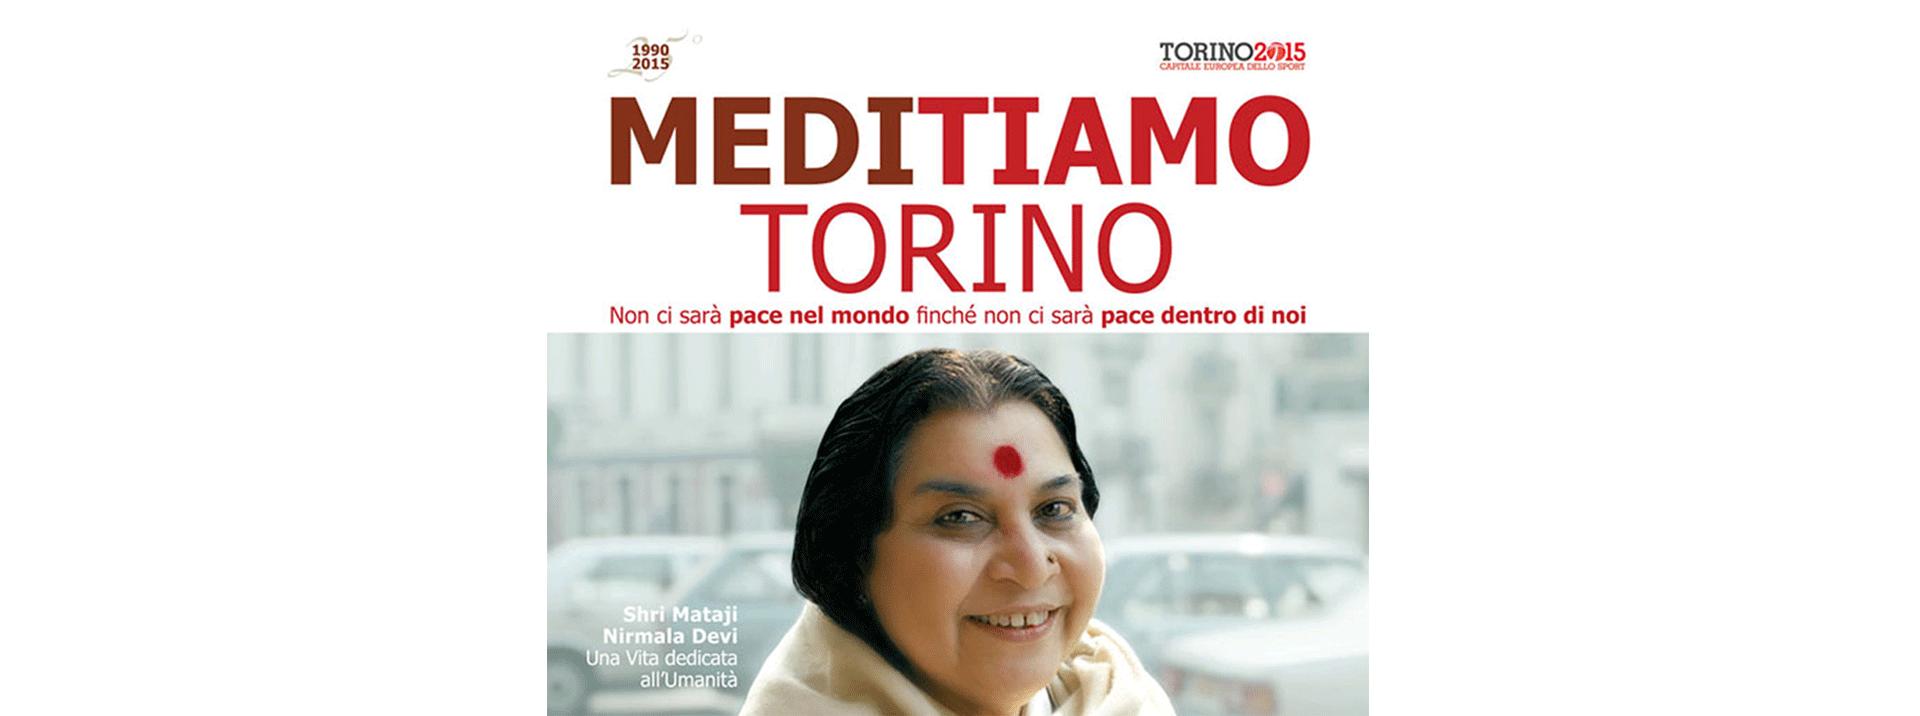 MEDITIAMO Torino